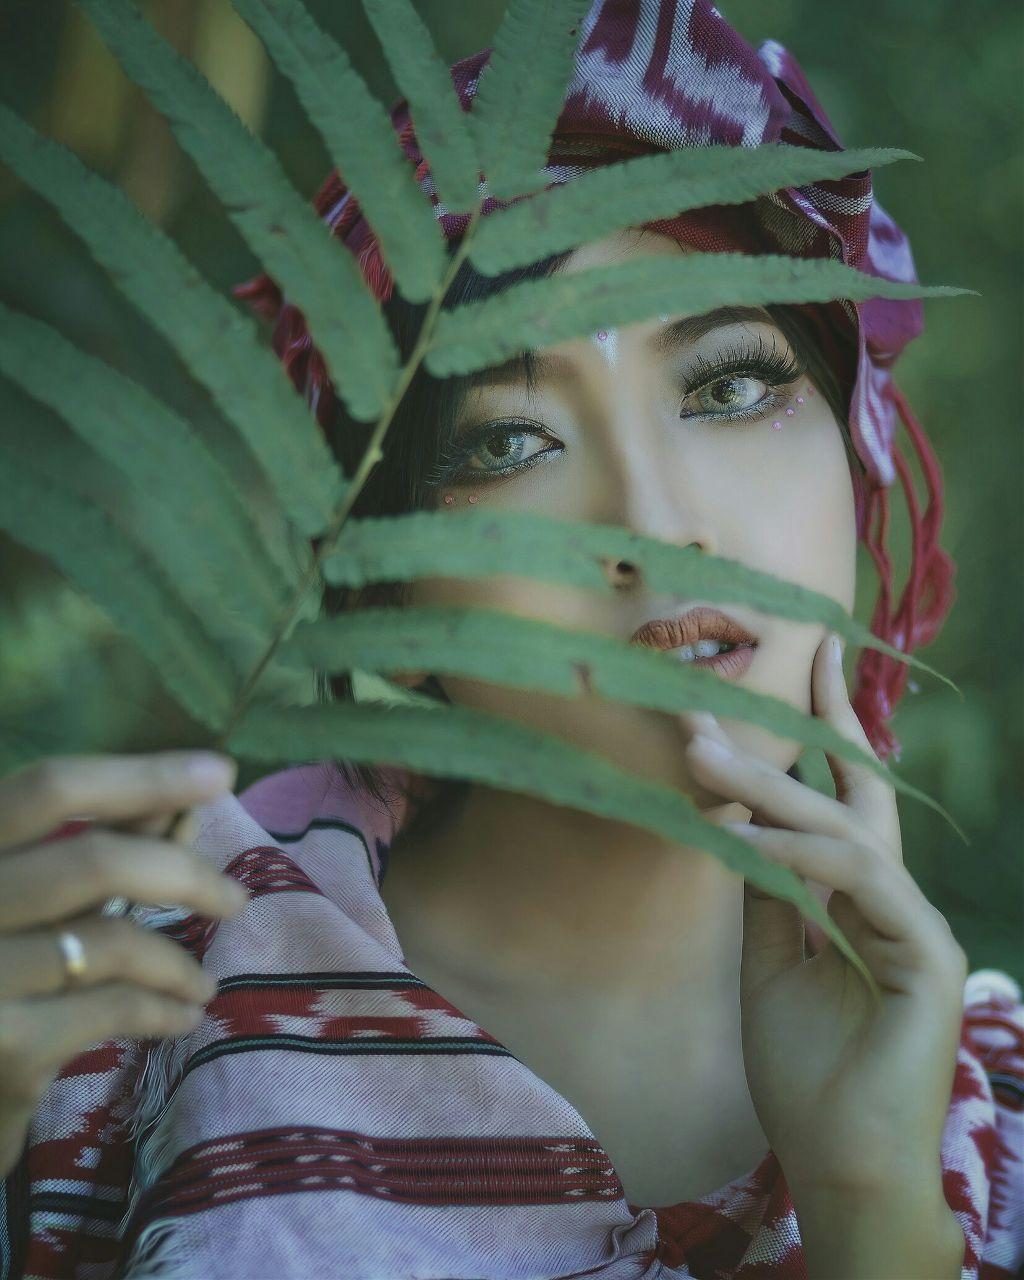 Beauty face Green & beaty #colorsplash #love #photography #vintage #drama #indonesia #green #smoke #pi #picsart  #tal #talent #models #beauty #cute #photograper #conseptualart #ubc_army #likes #followme #indonesiangirl  #freetoedit